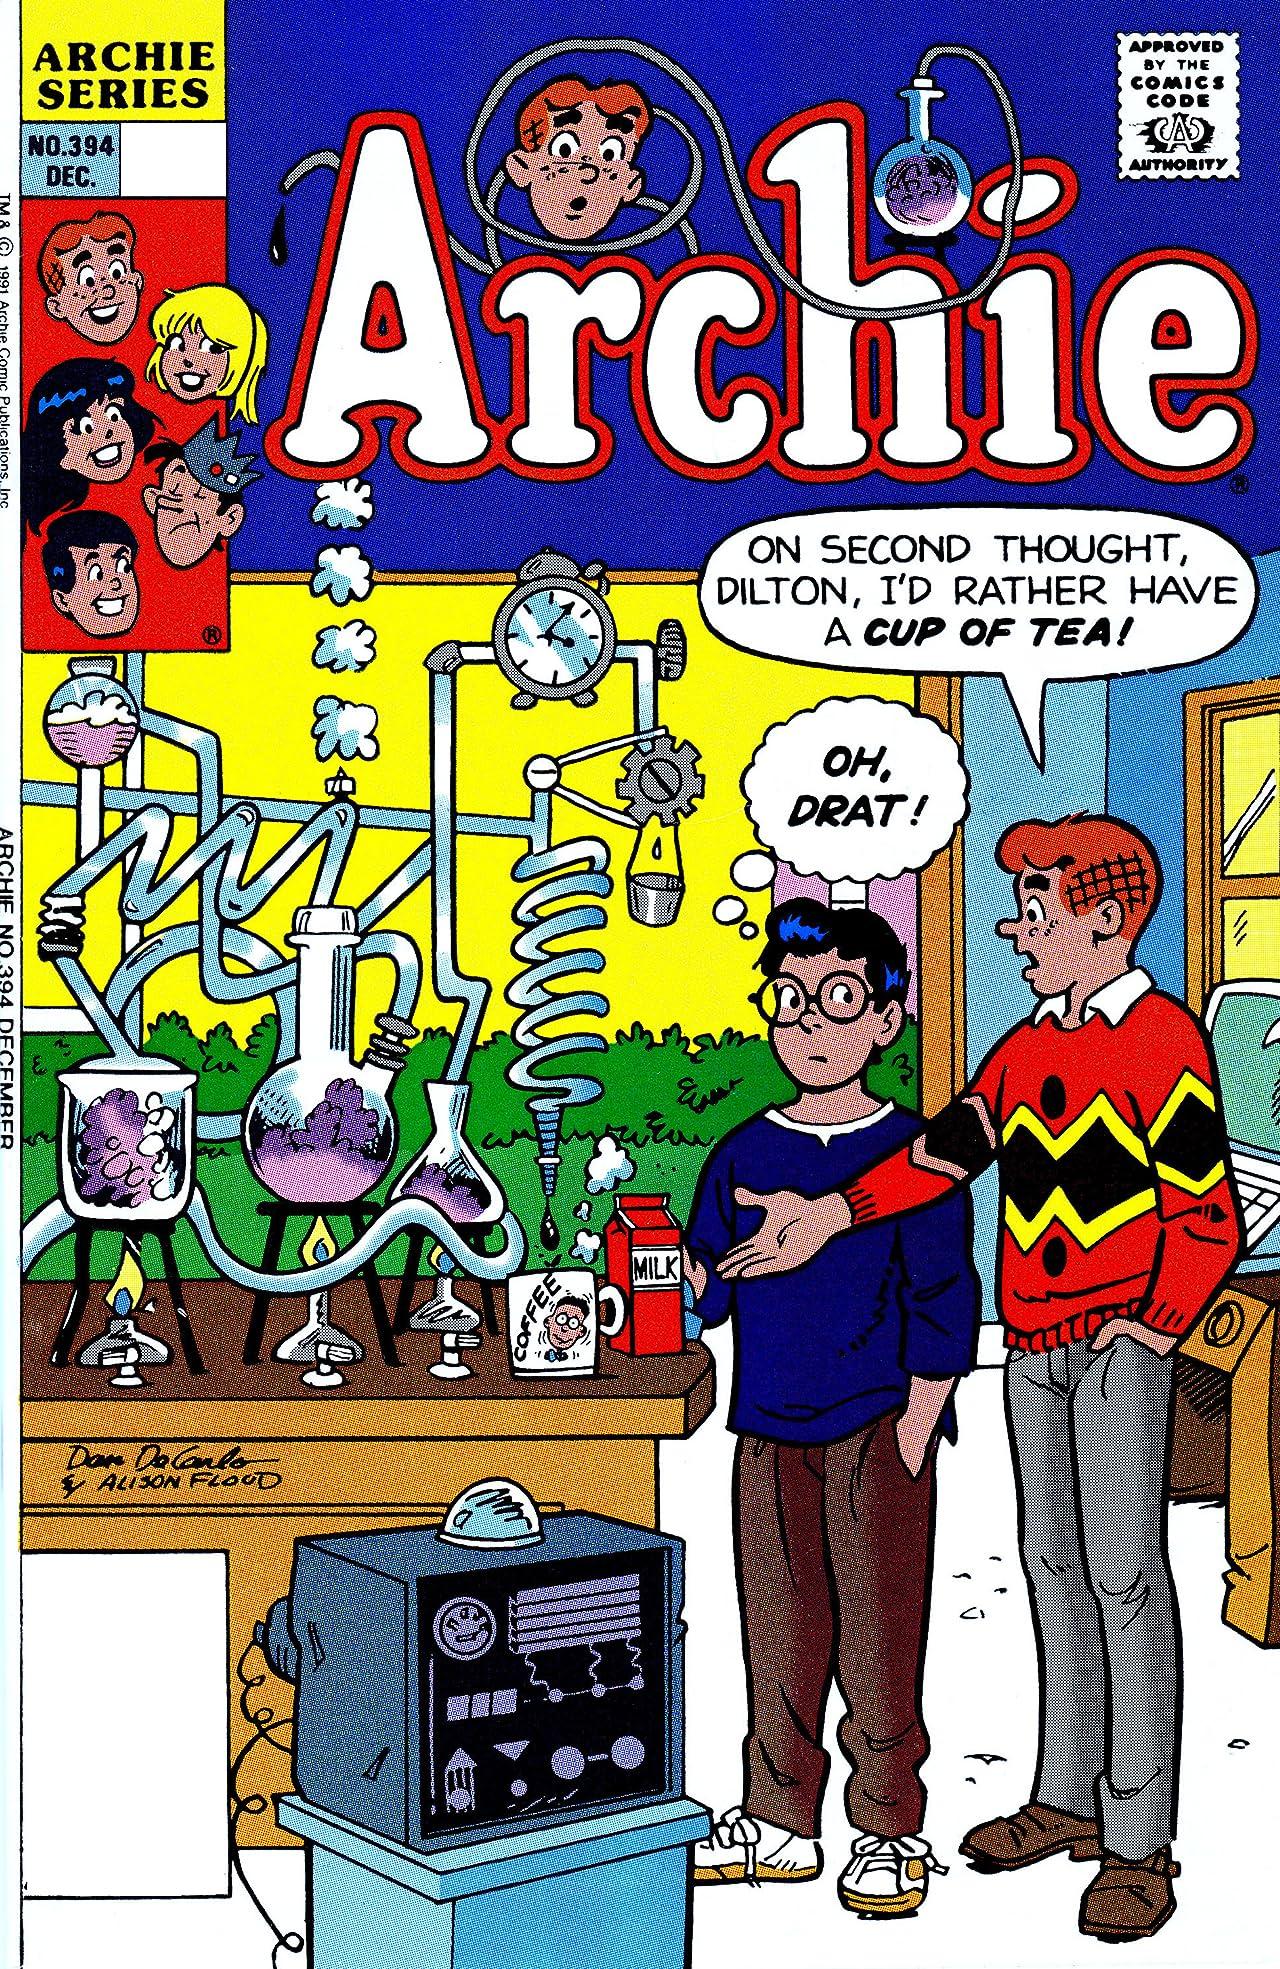 Archie #394